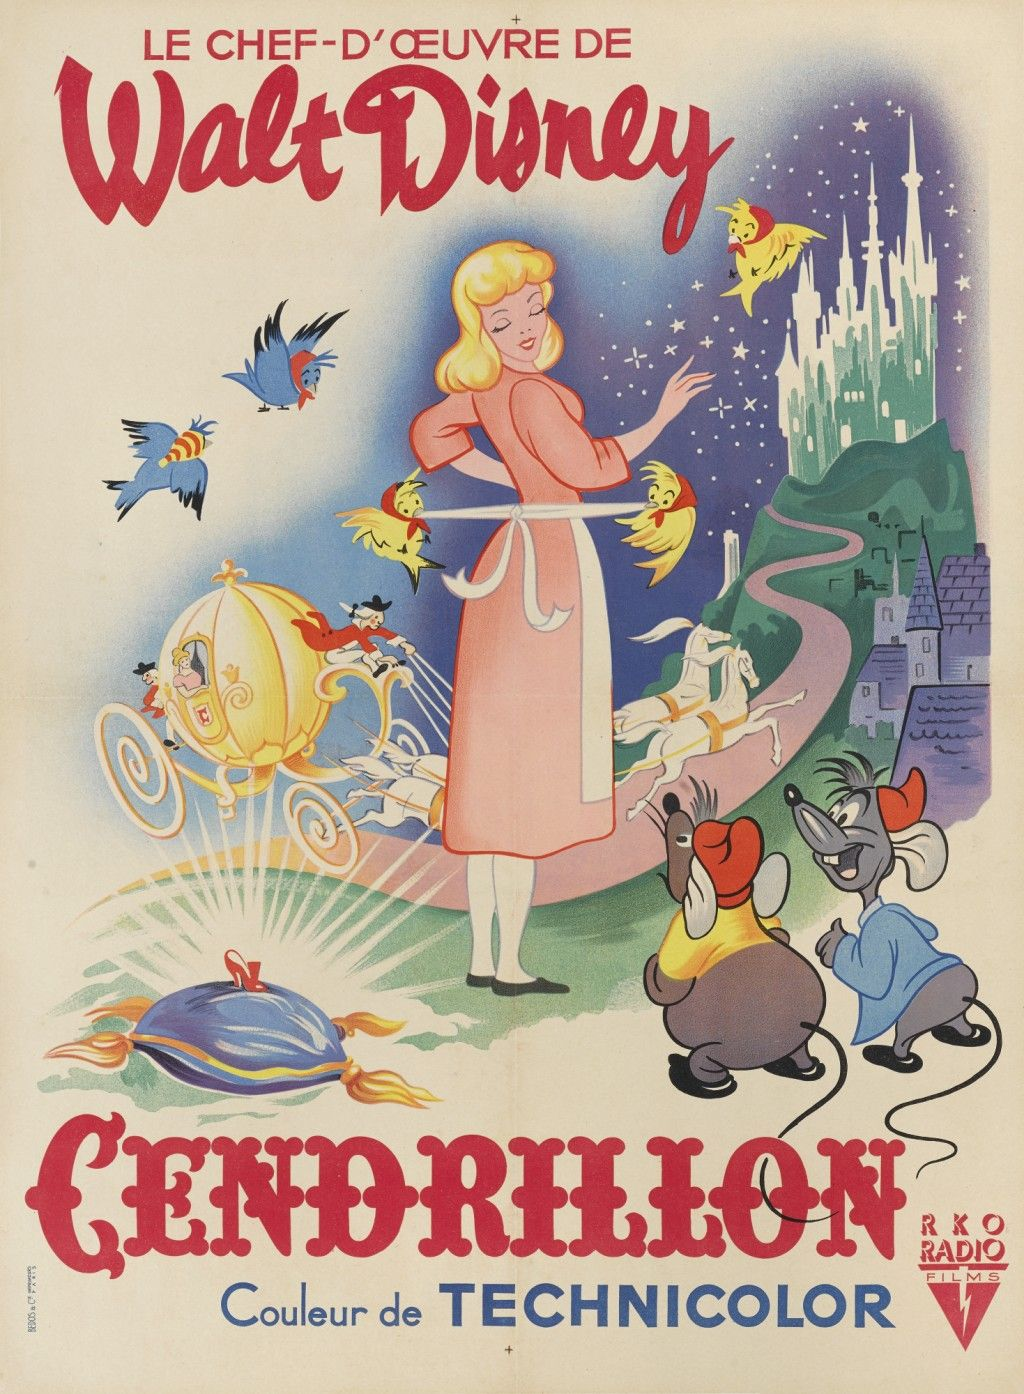 Original Film Posters Online Place Bid Disney Wallpaper Vintage Cartoon Retro Poster